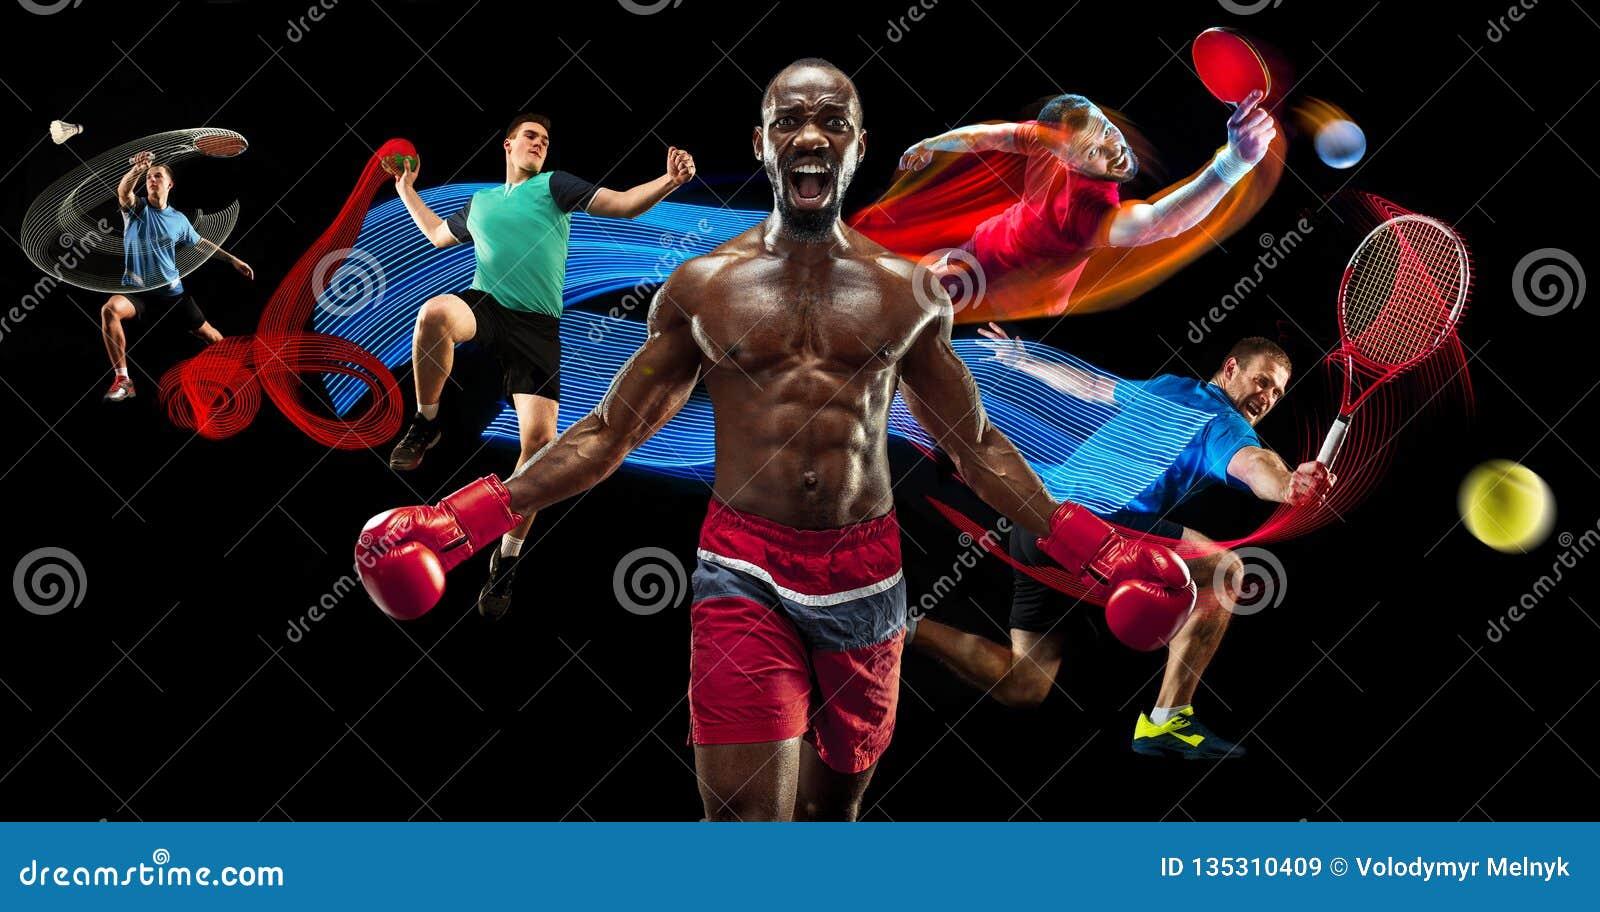 Atak Bawi się kolaż o badminton, tenisa, boksu i handball graczach,